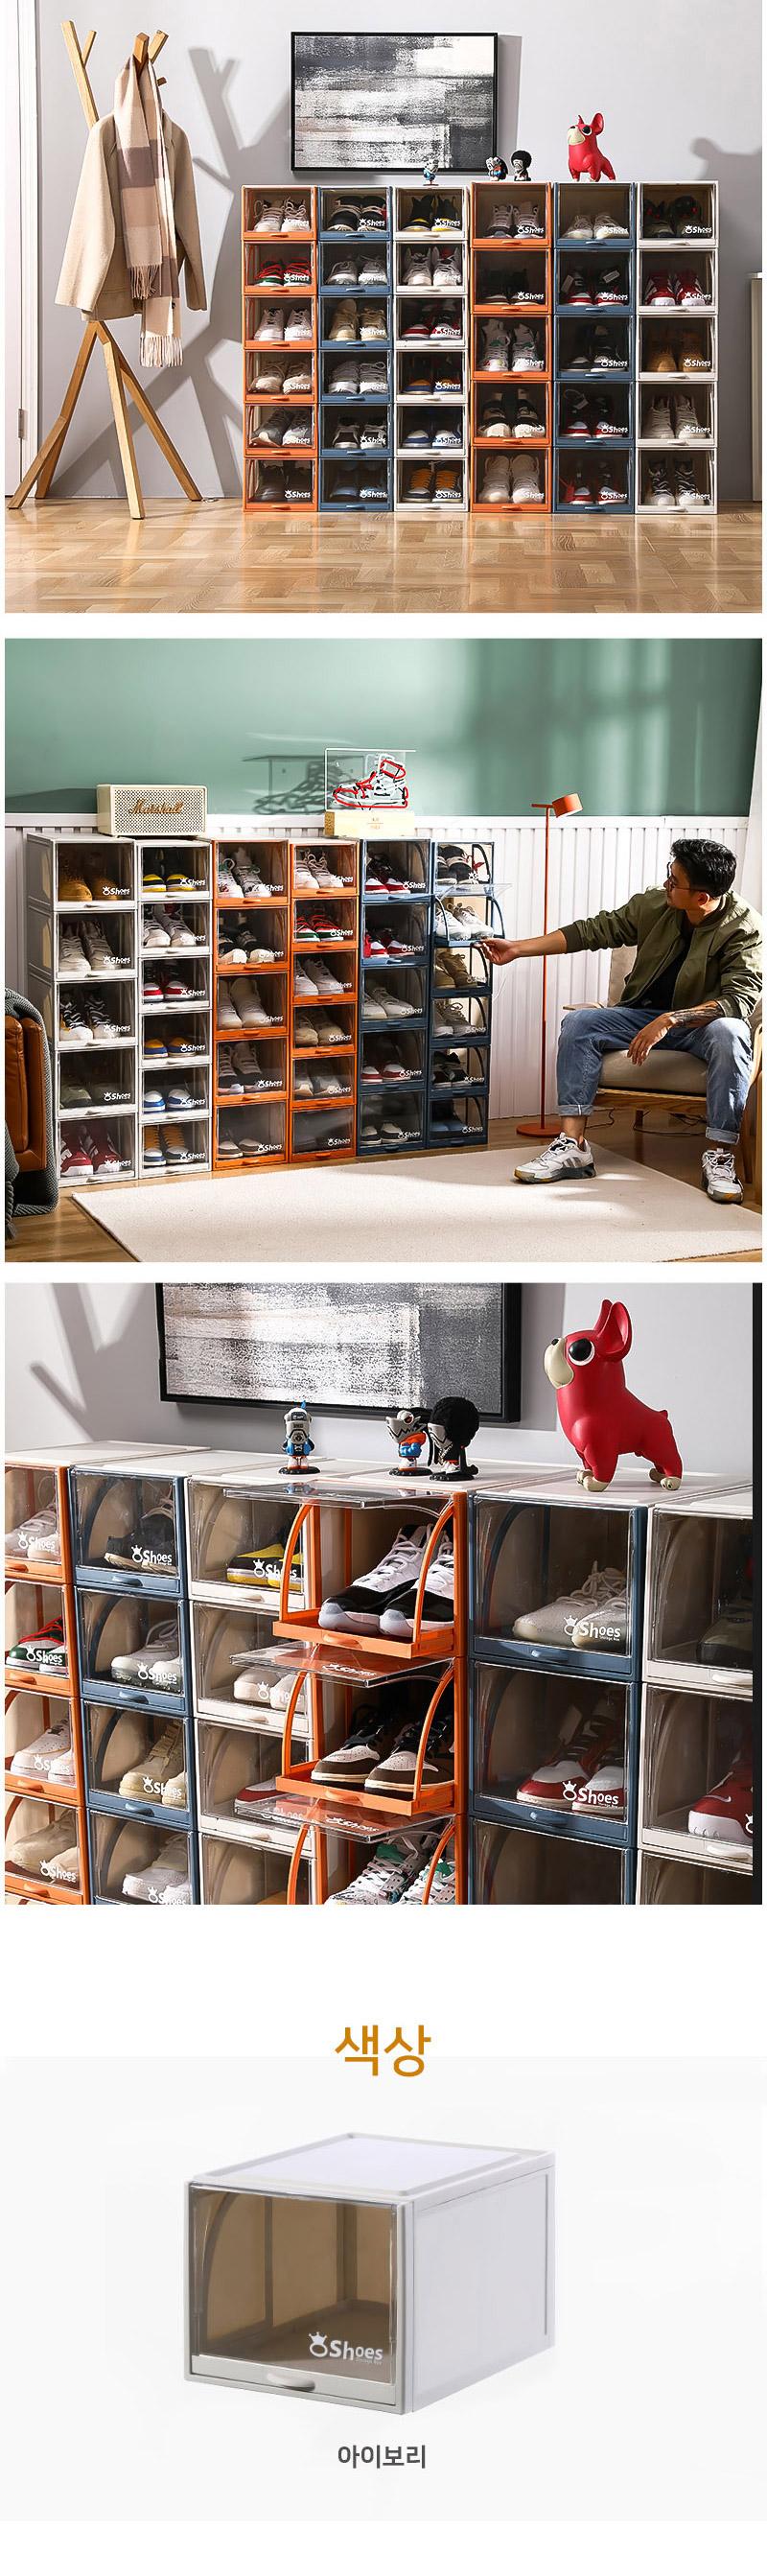 trandy_sliding_shoesbox_05_113335.jpg